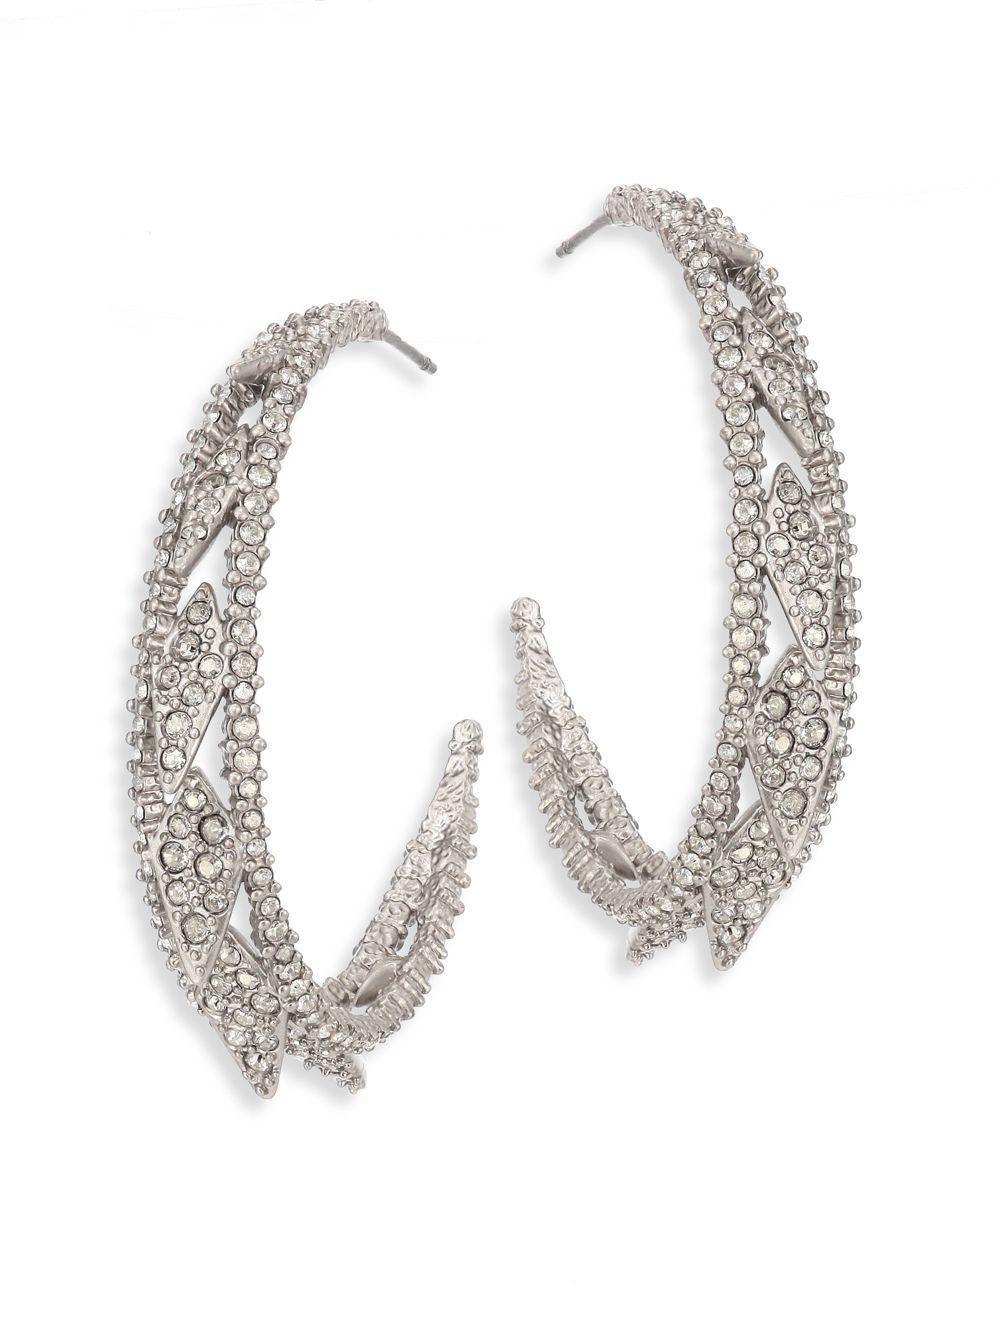 Alexis Bittar Crystal Lattice Hoop Earrings jezV8